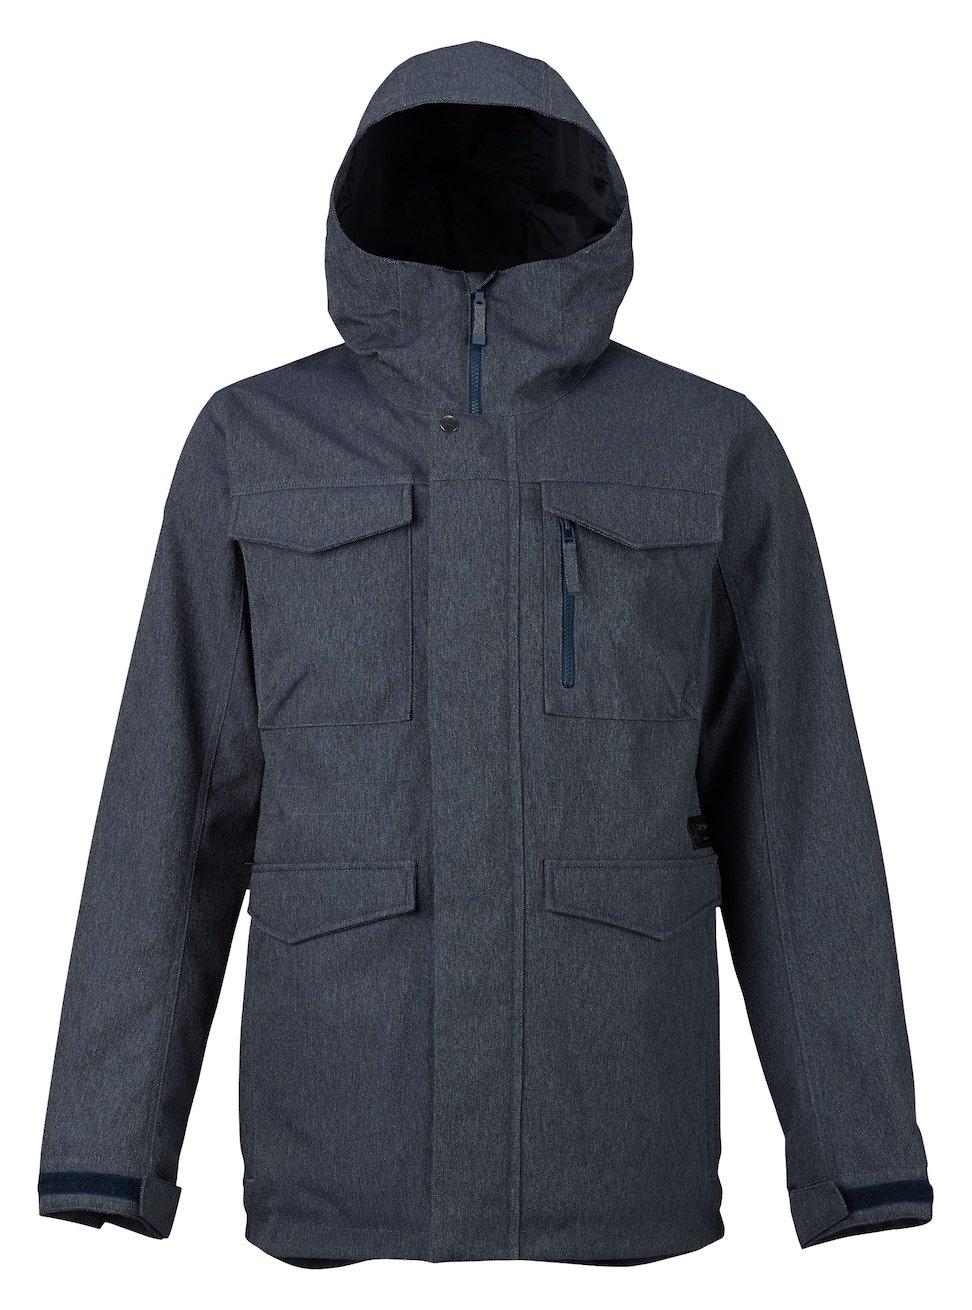 Burton Men's Covert Jacket, Denim, XX-Small by Burton